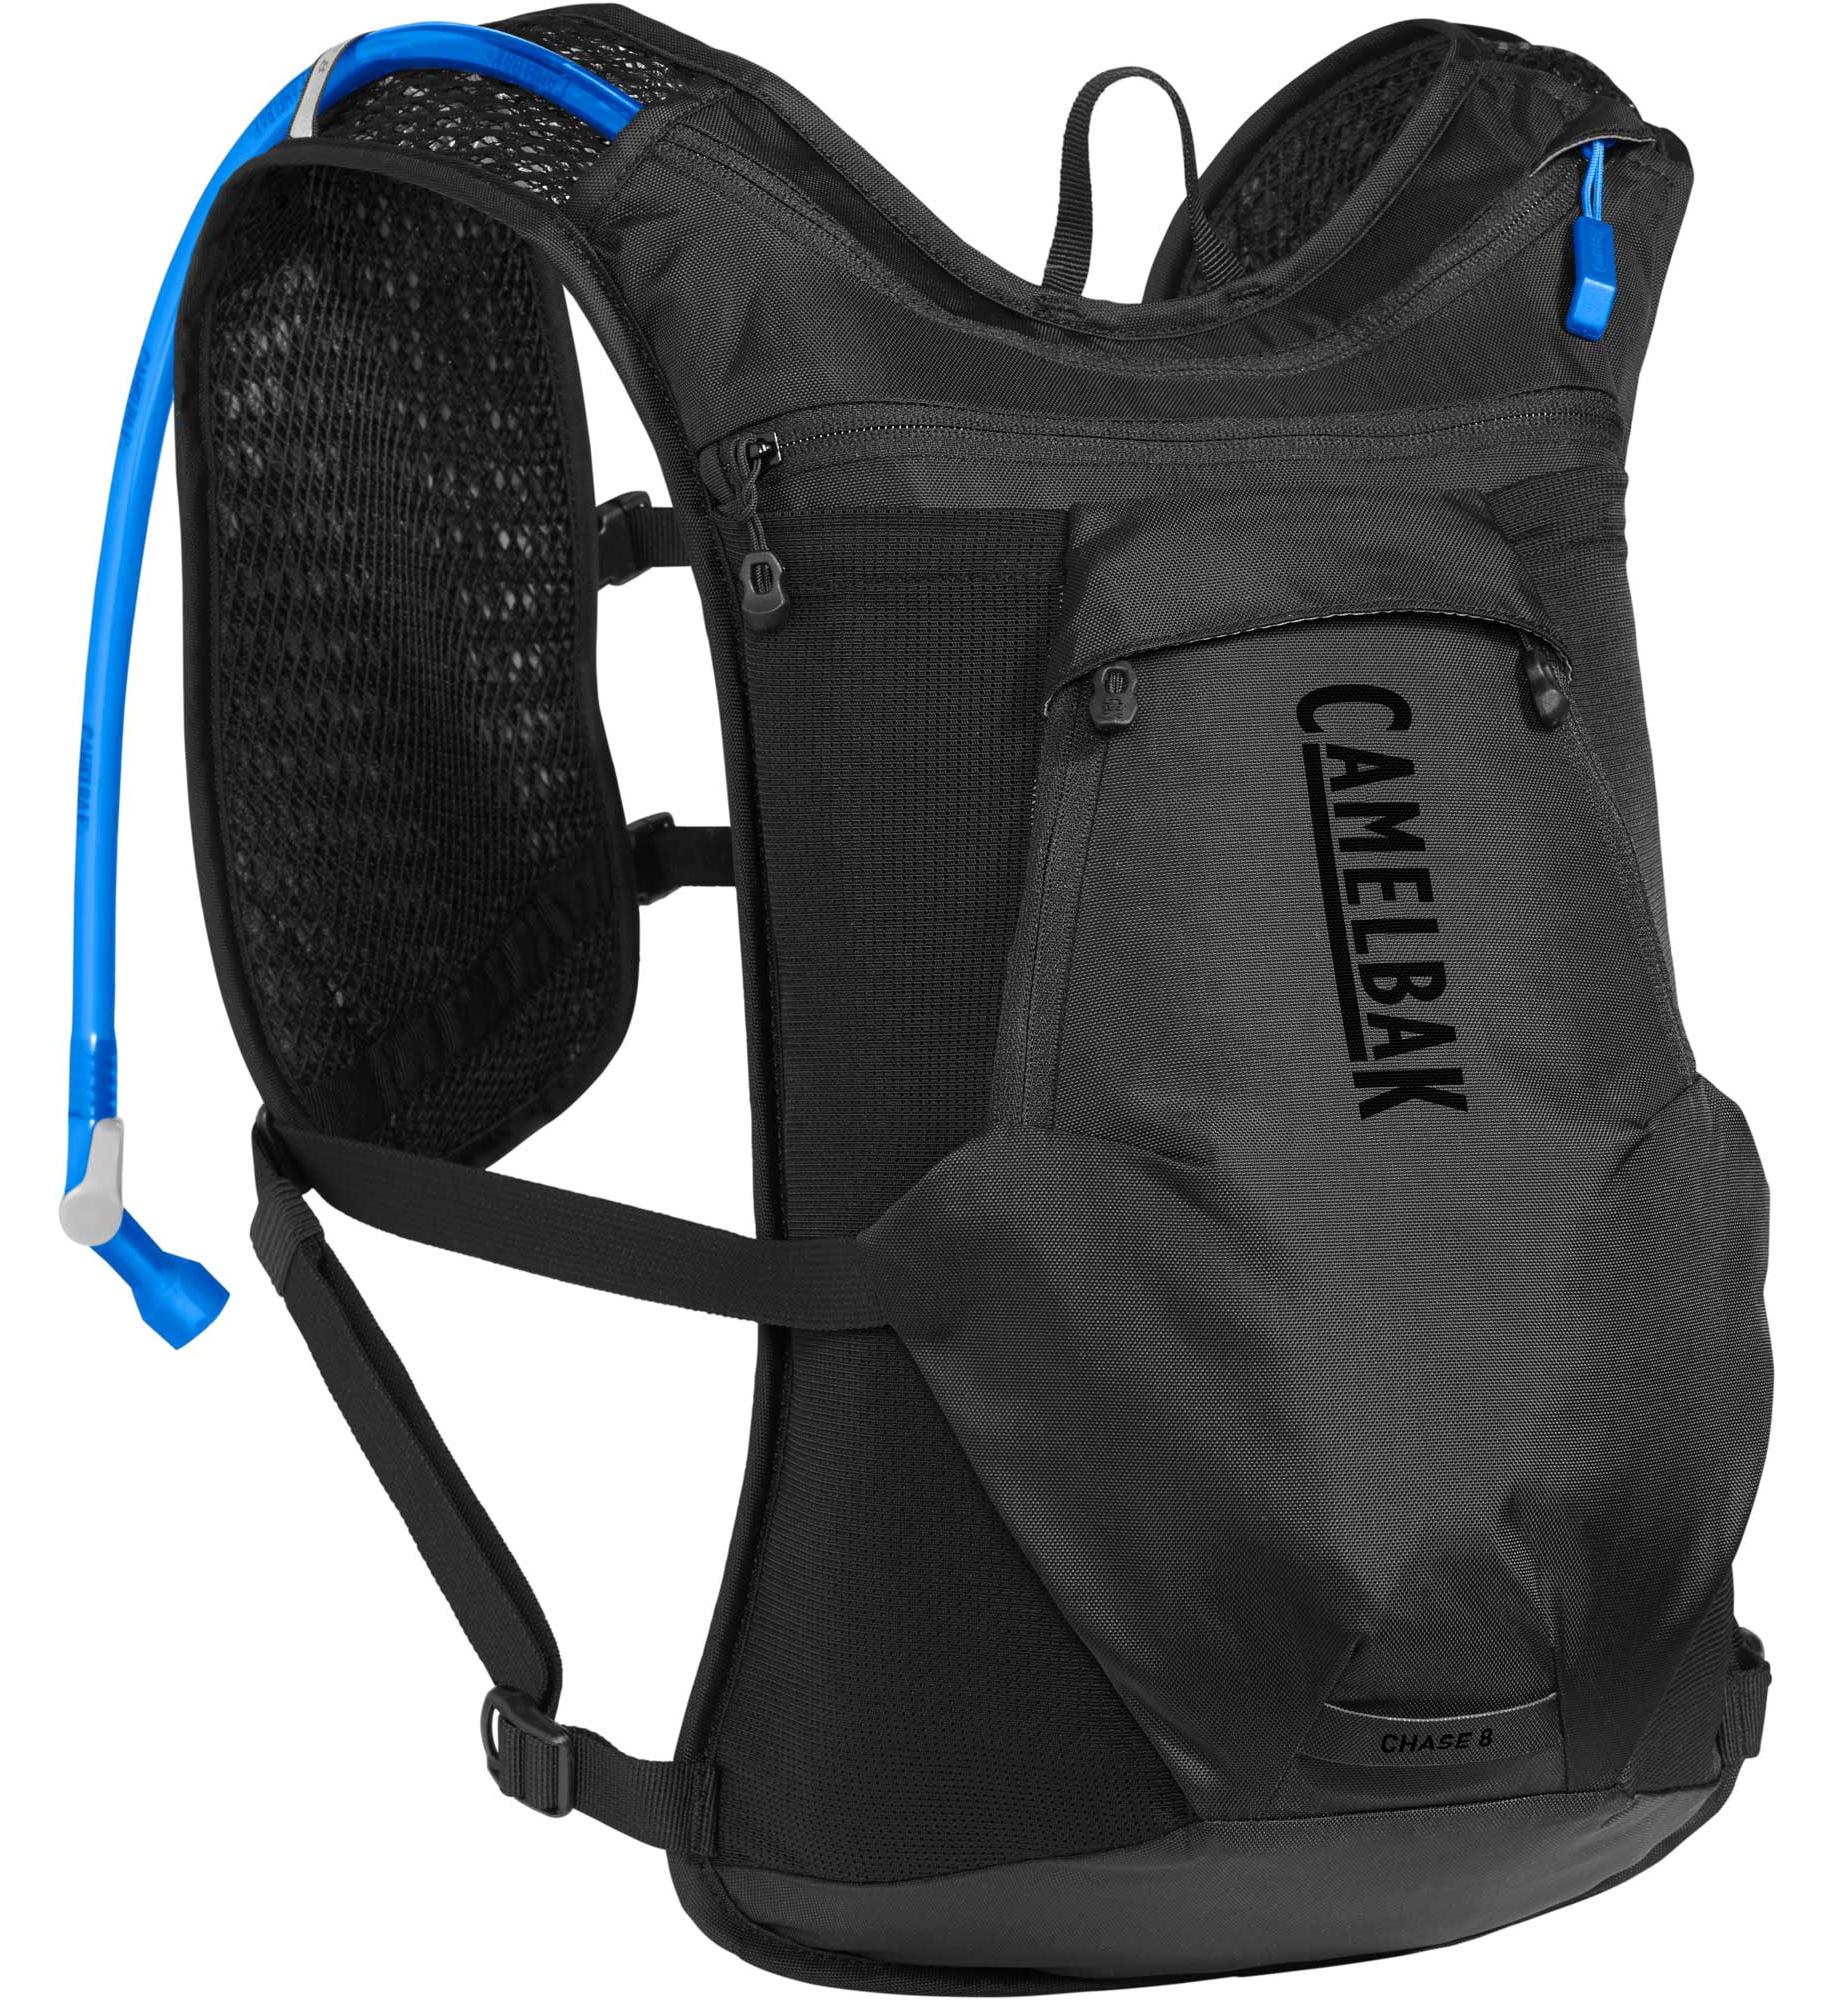 Camelbak | Chase 8 Vest 70oz Black